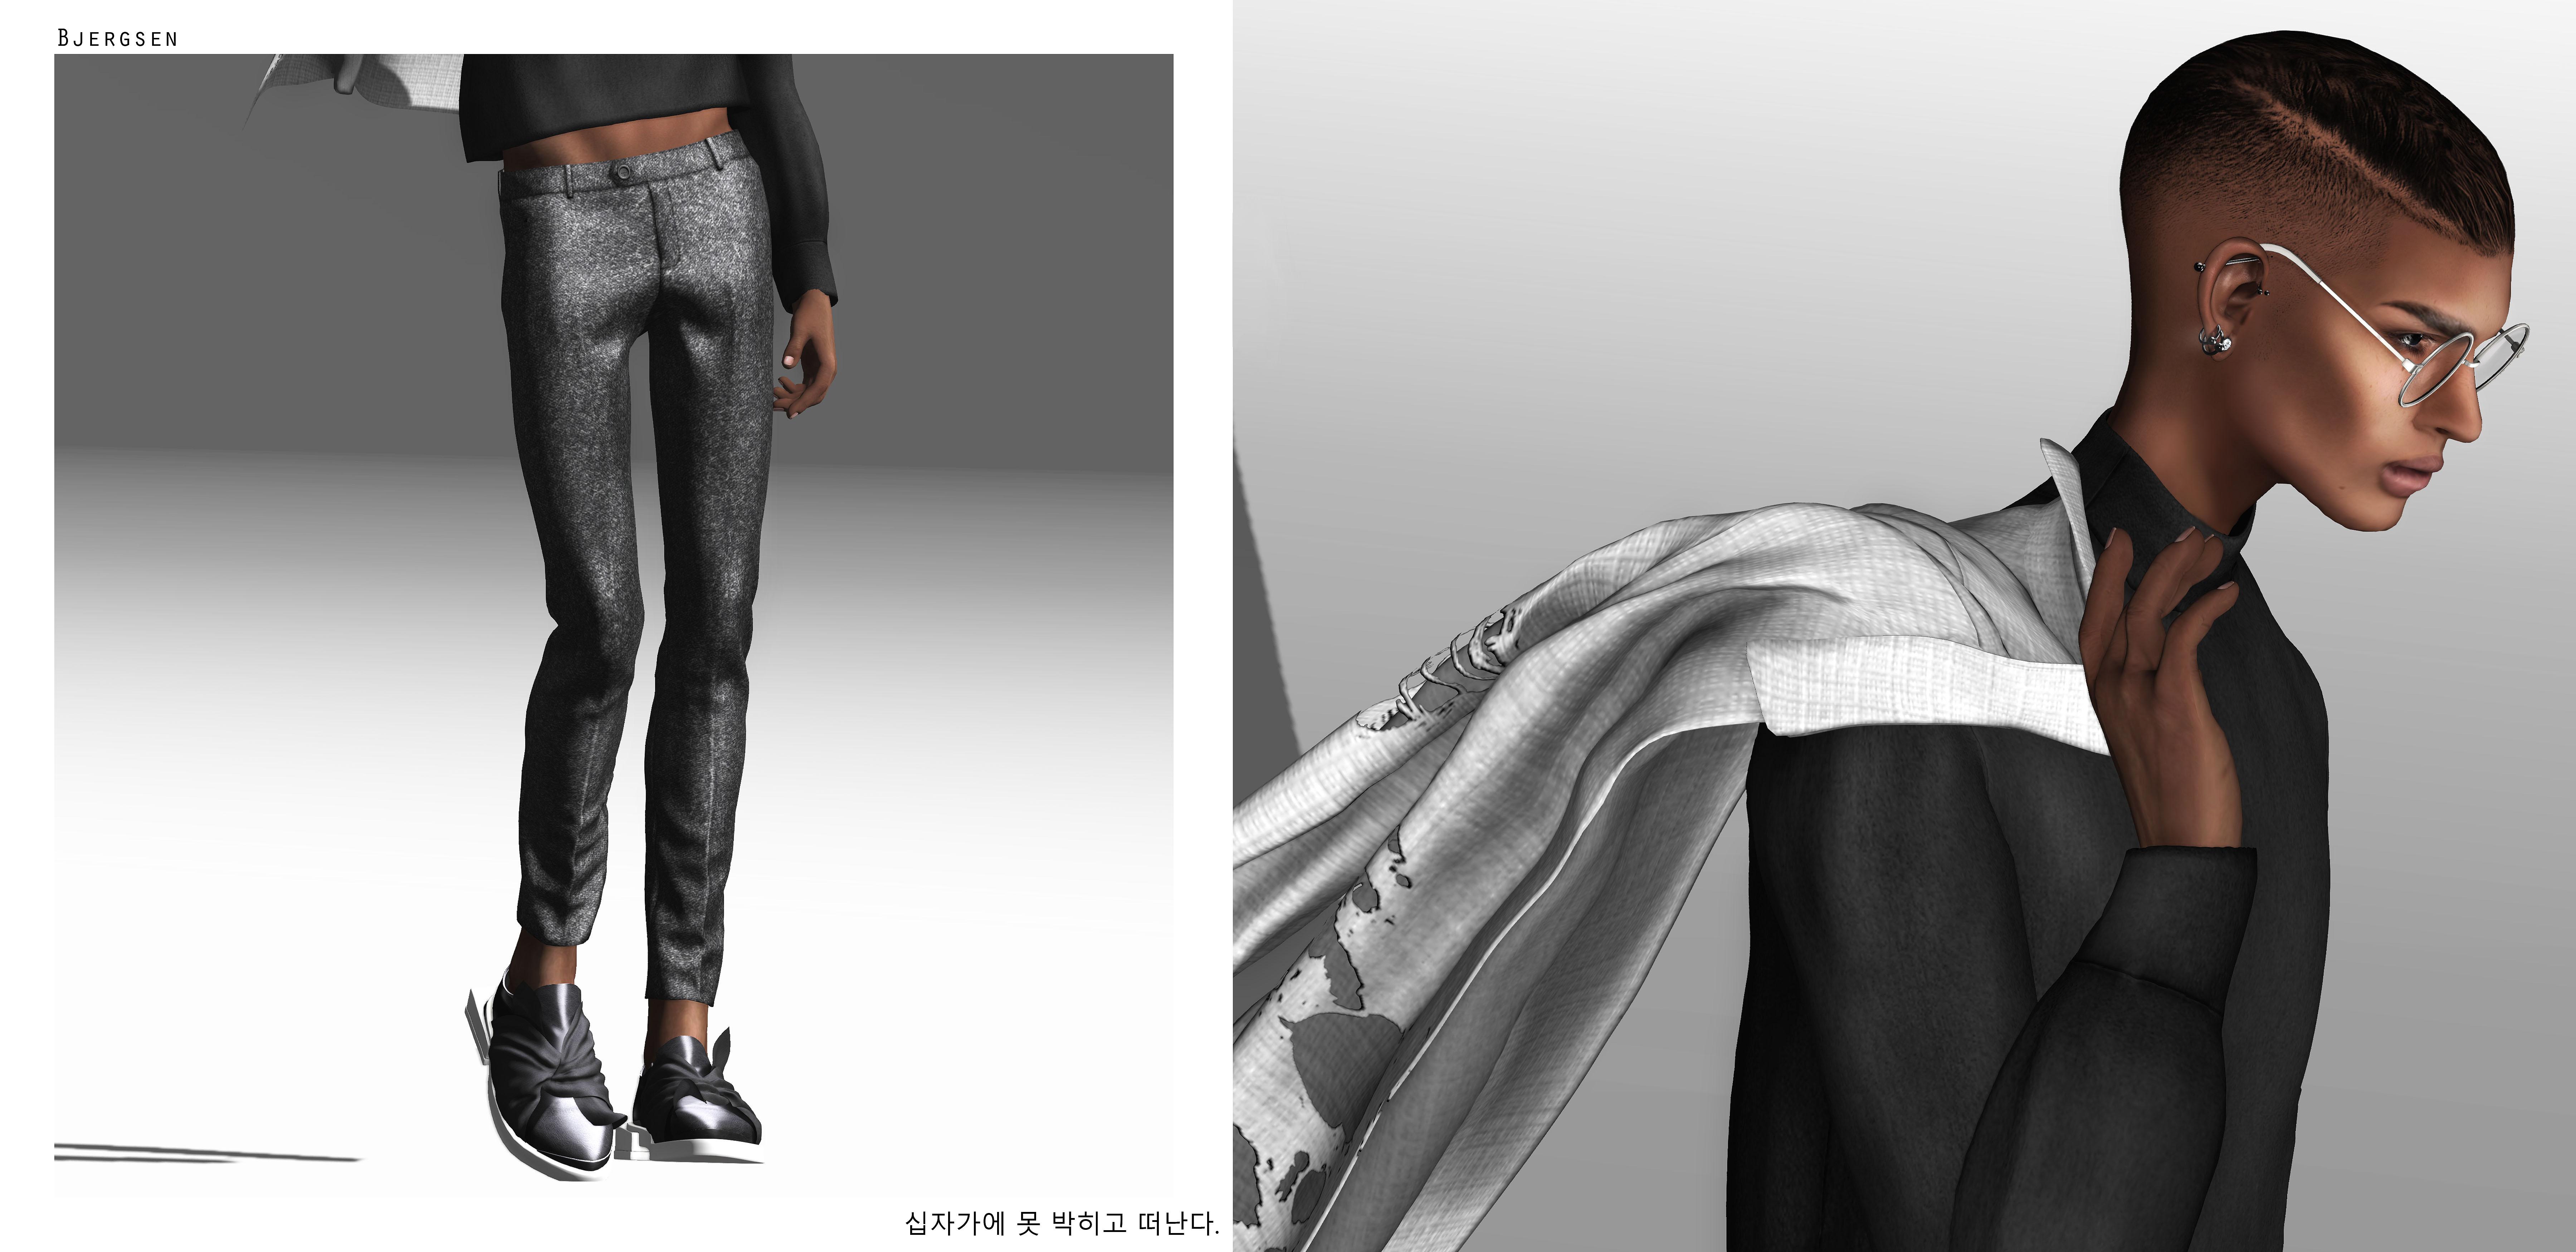 Hair Style Jeans: Wallpaper : Long Hair, Glasses, Jeans, Jacket, Pants